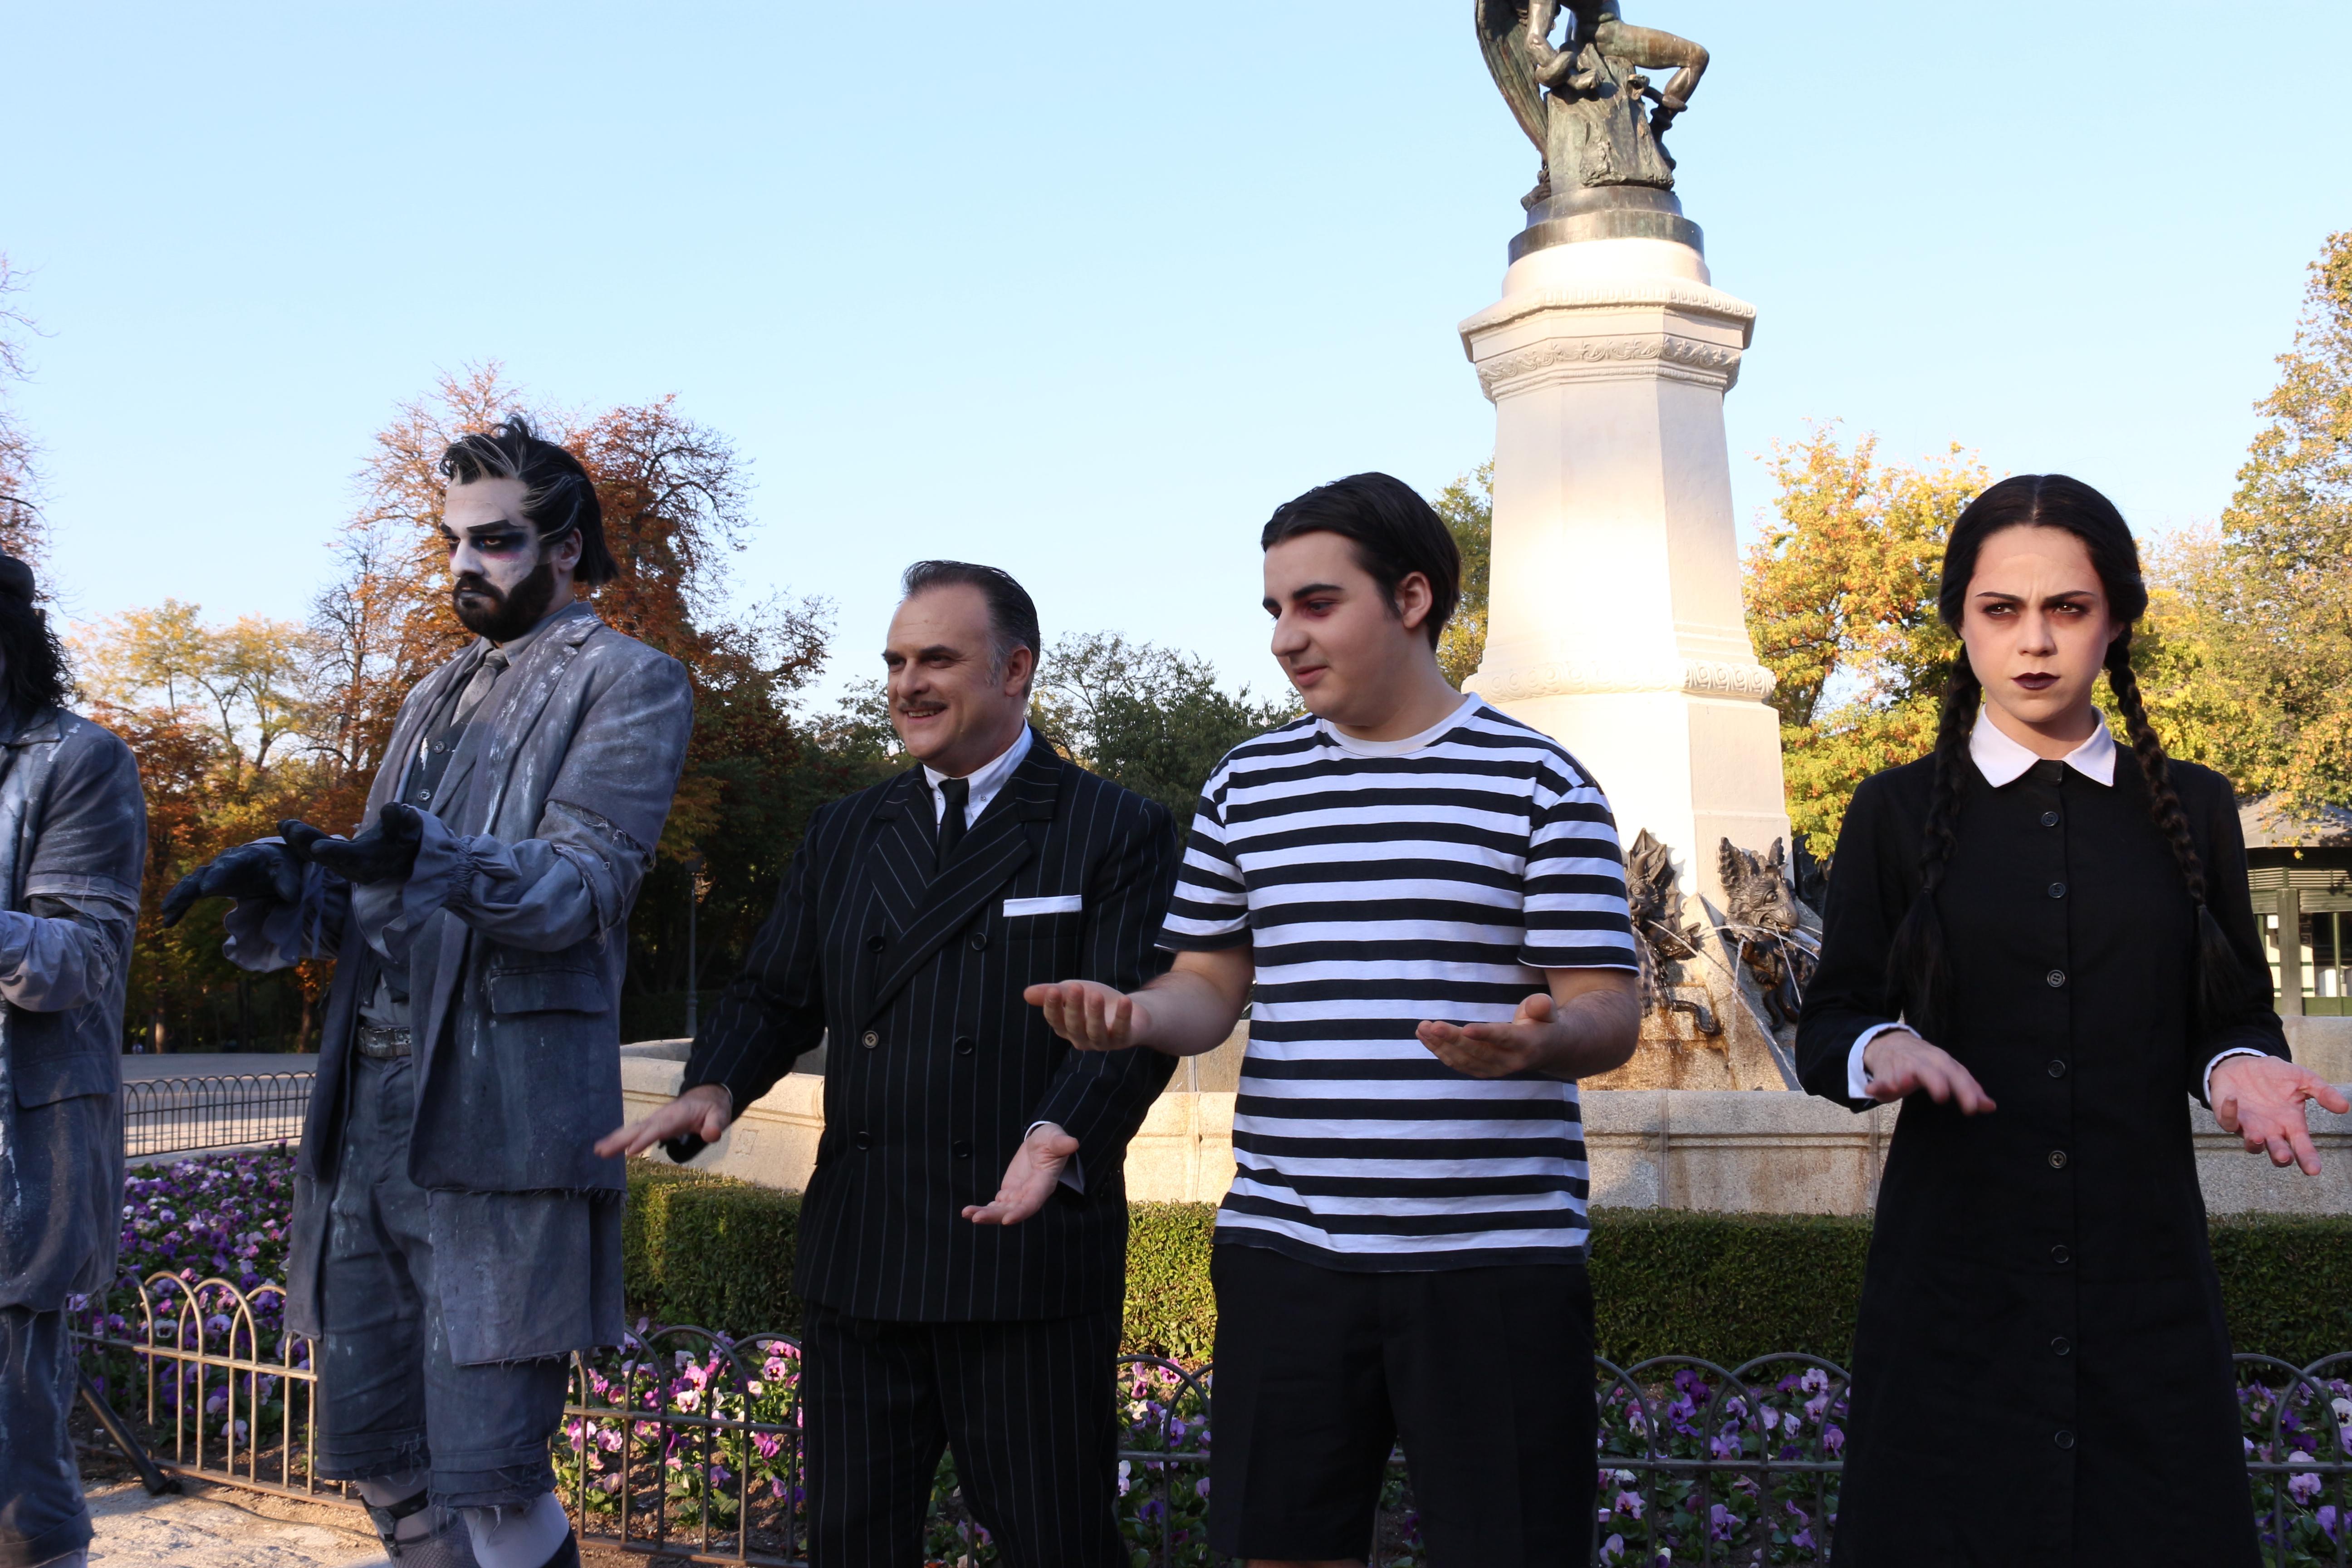 La Familia Addams salió a la calle a celebrar Halloween